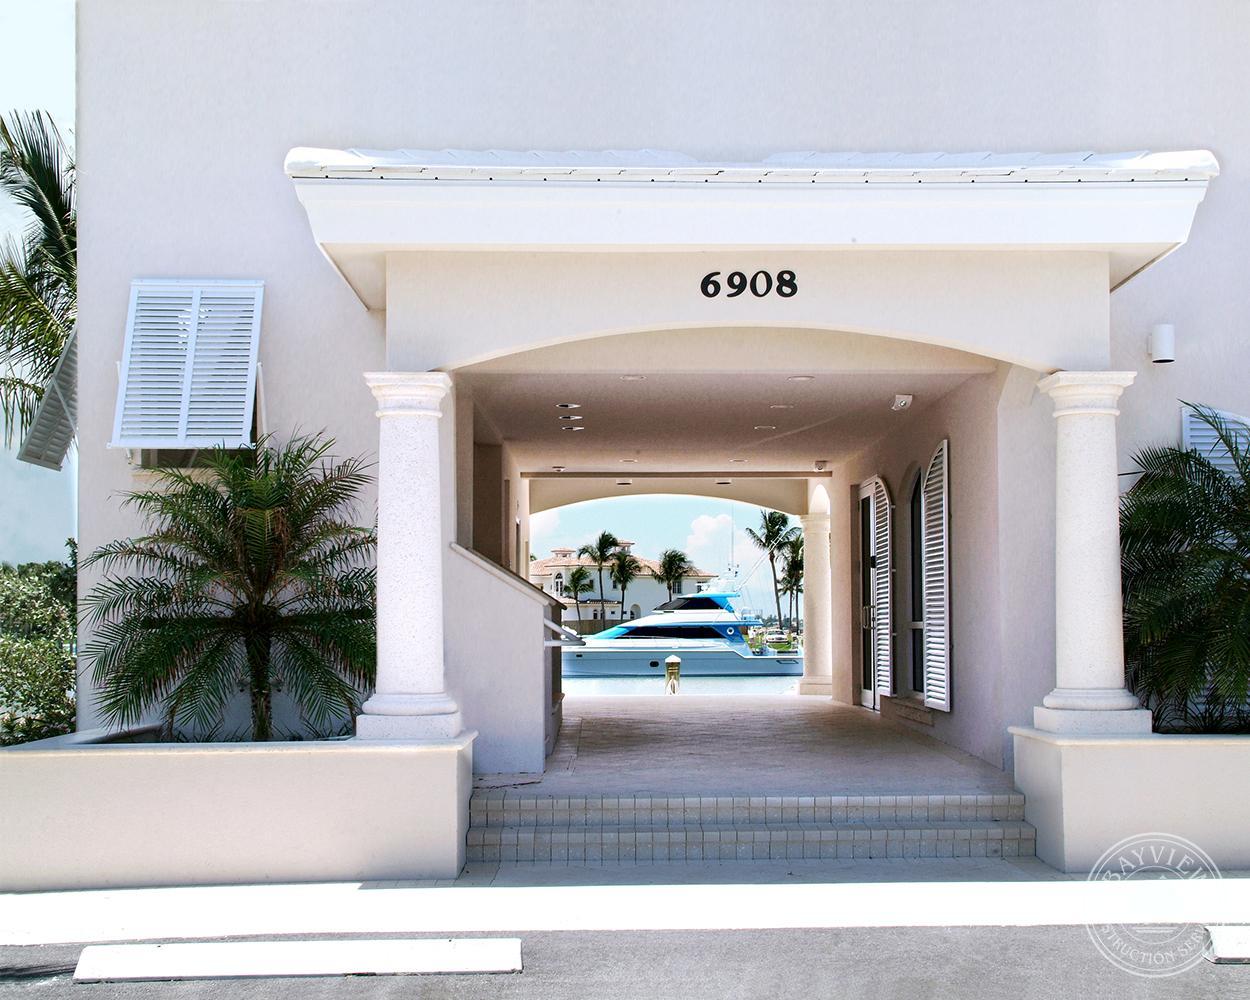 Marina Entrance - Sailfish Point Marina & Yacht Club Hutchinson Island, FL